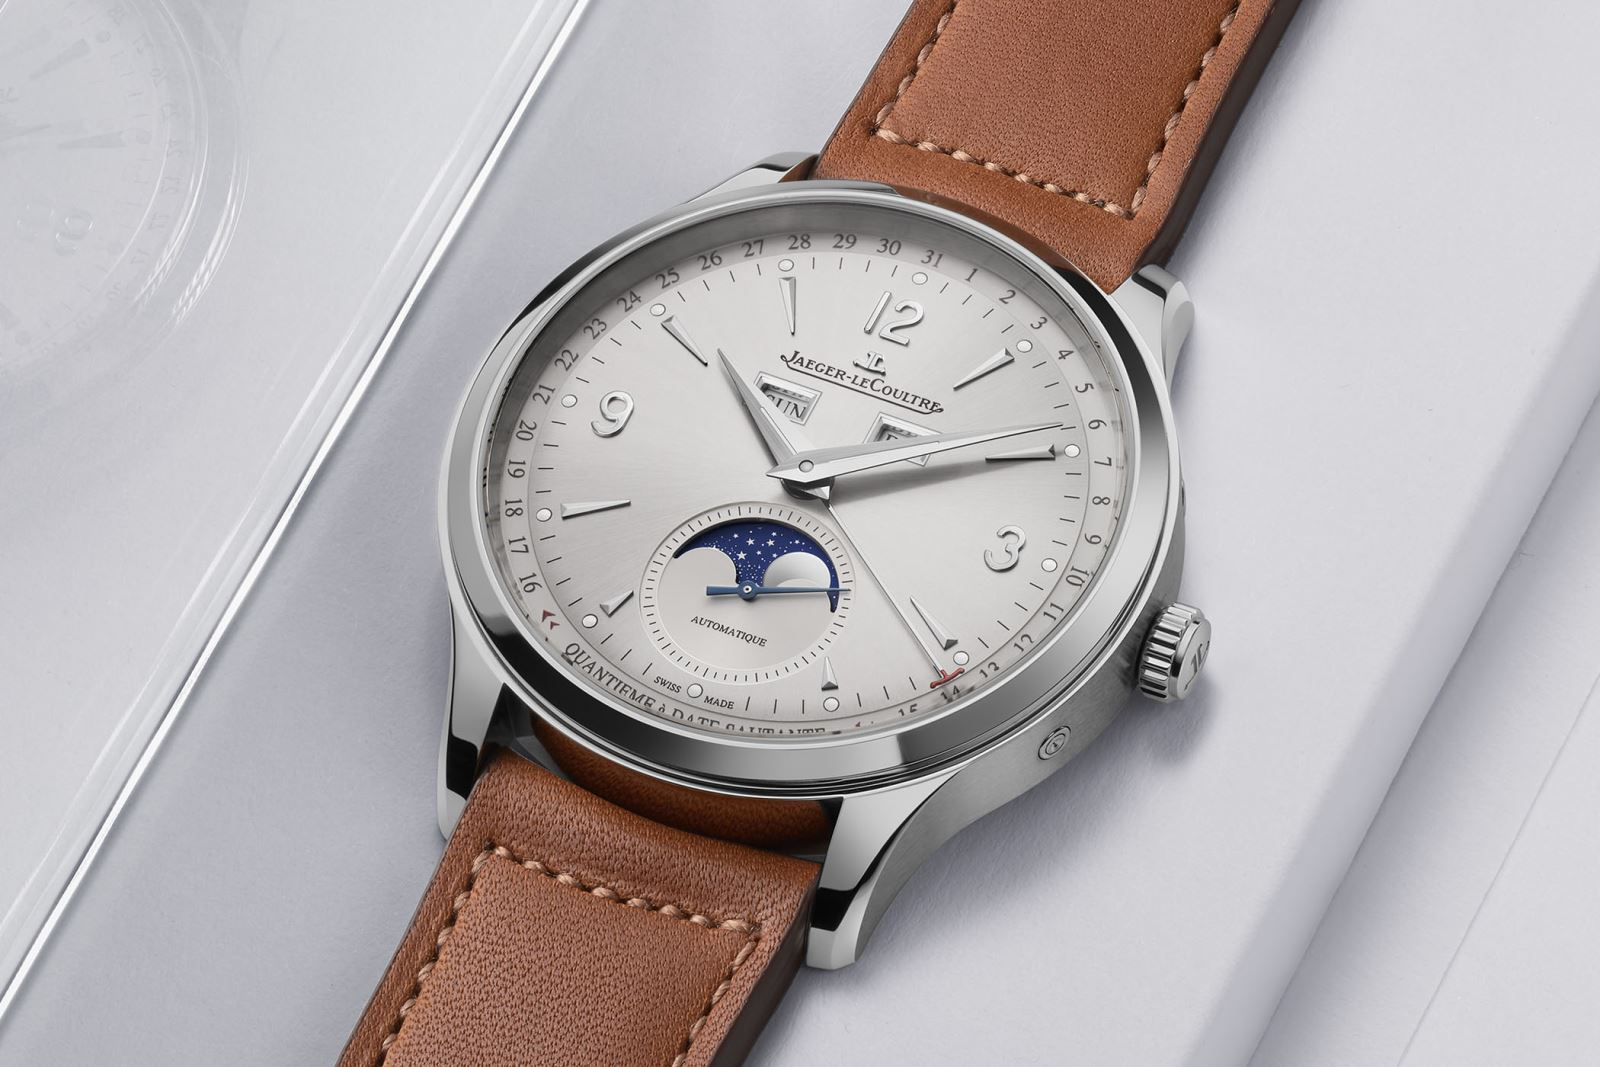 đồng hồ Jaeger-LeCoultre Master Control Calendar